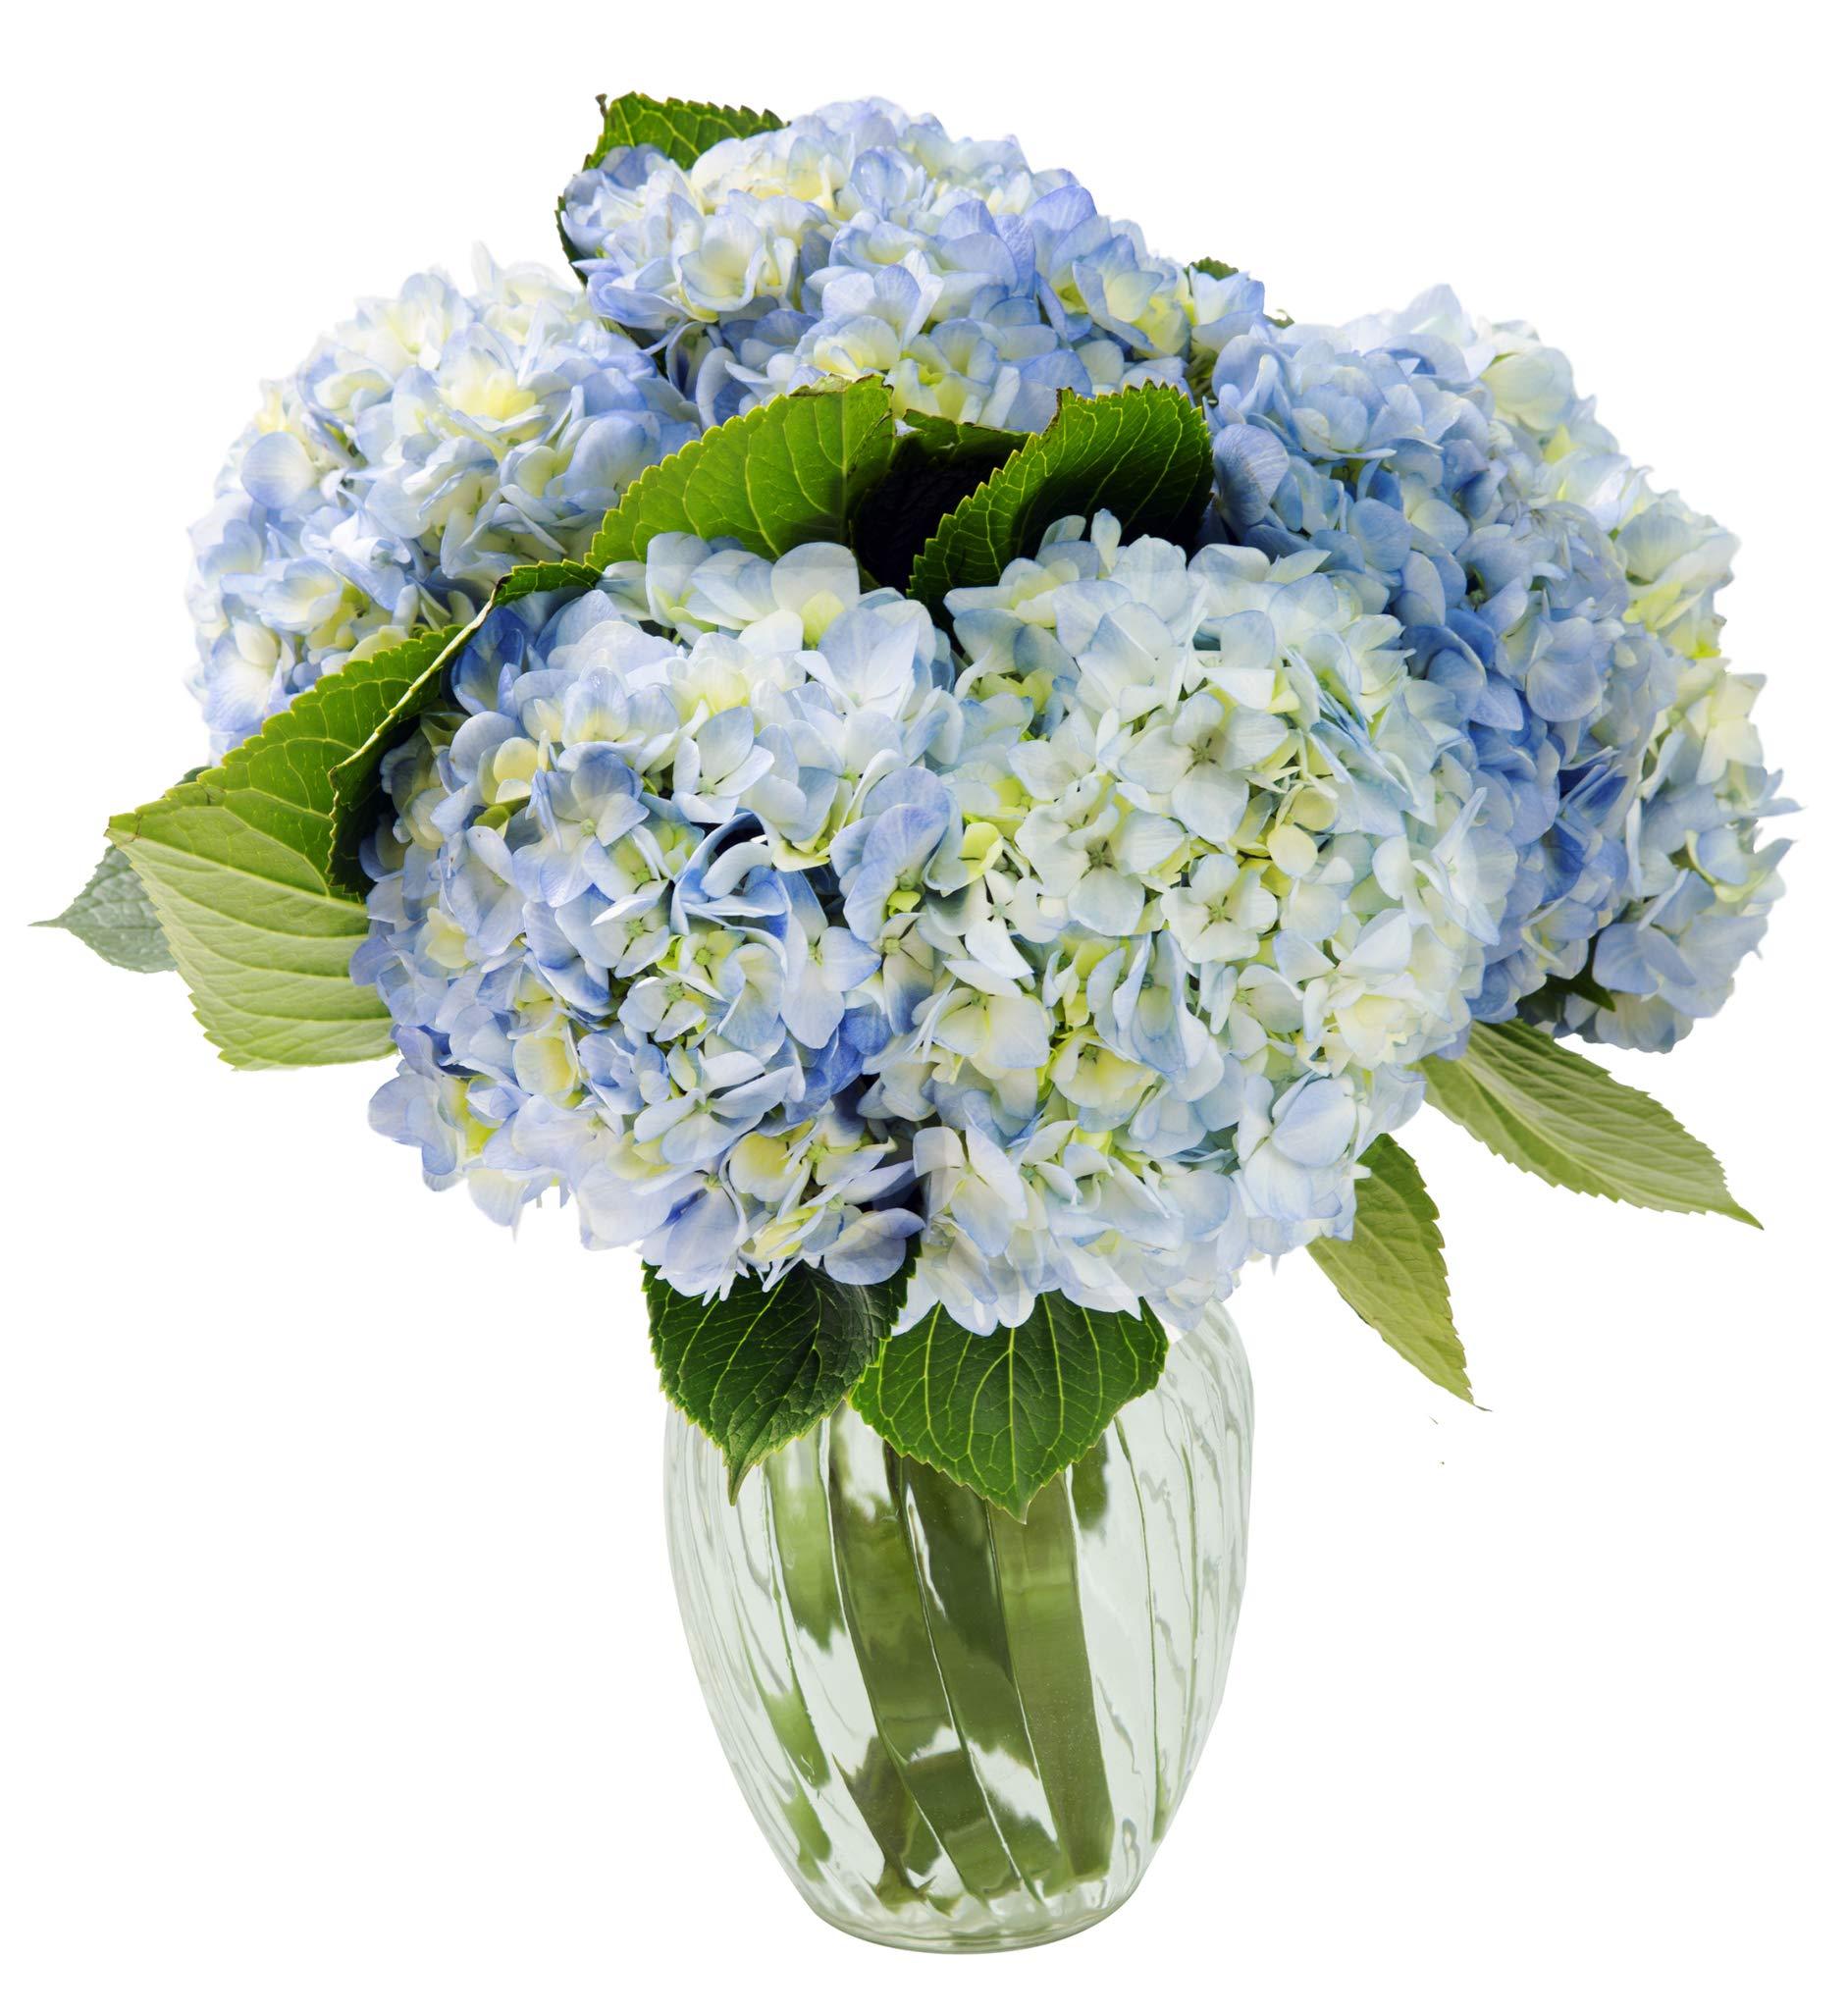 KaBloom Summer Beauty Bouquet of 6 Blue Hydrangeas with Vase